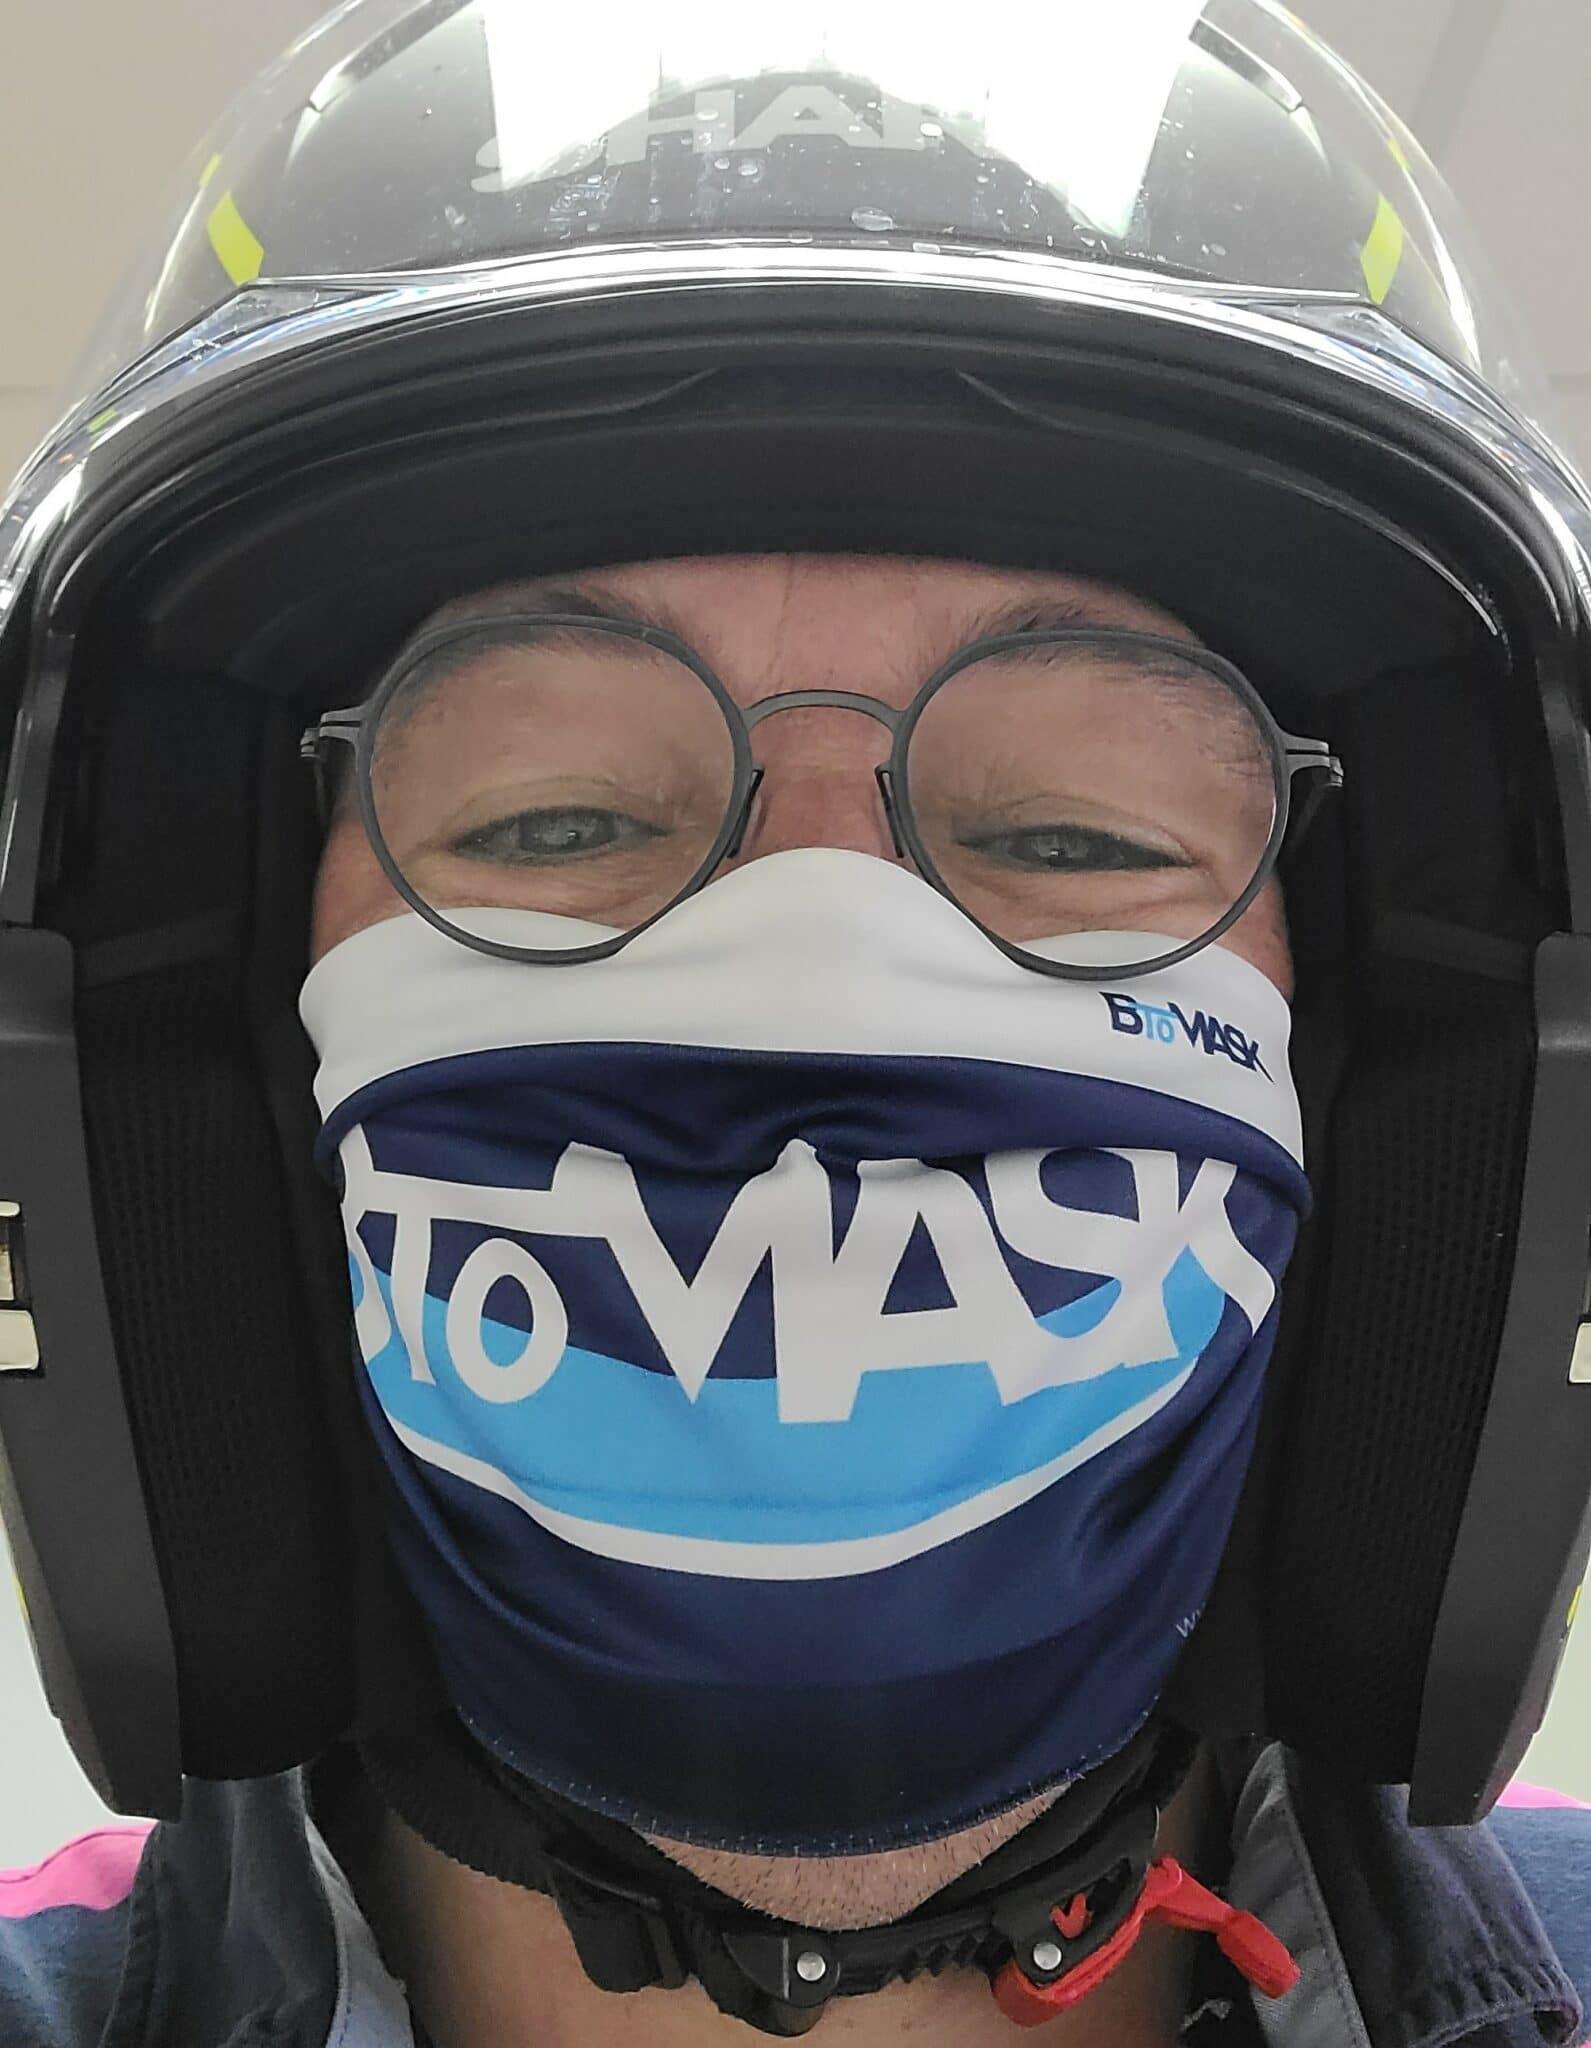 Masque Btomask avec casque moto